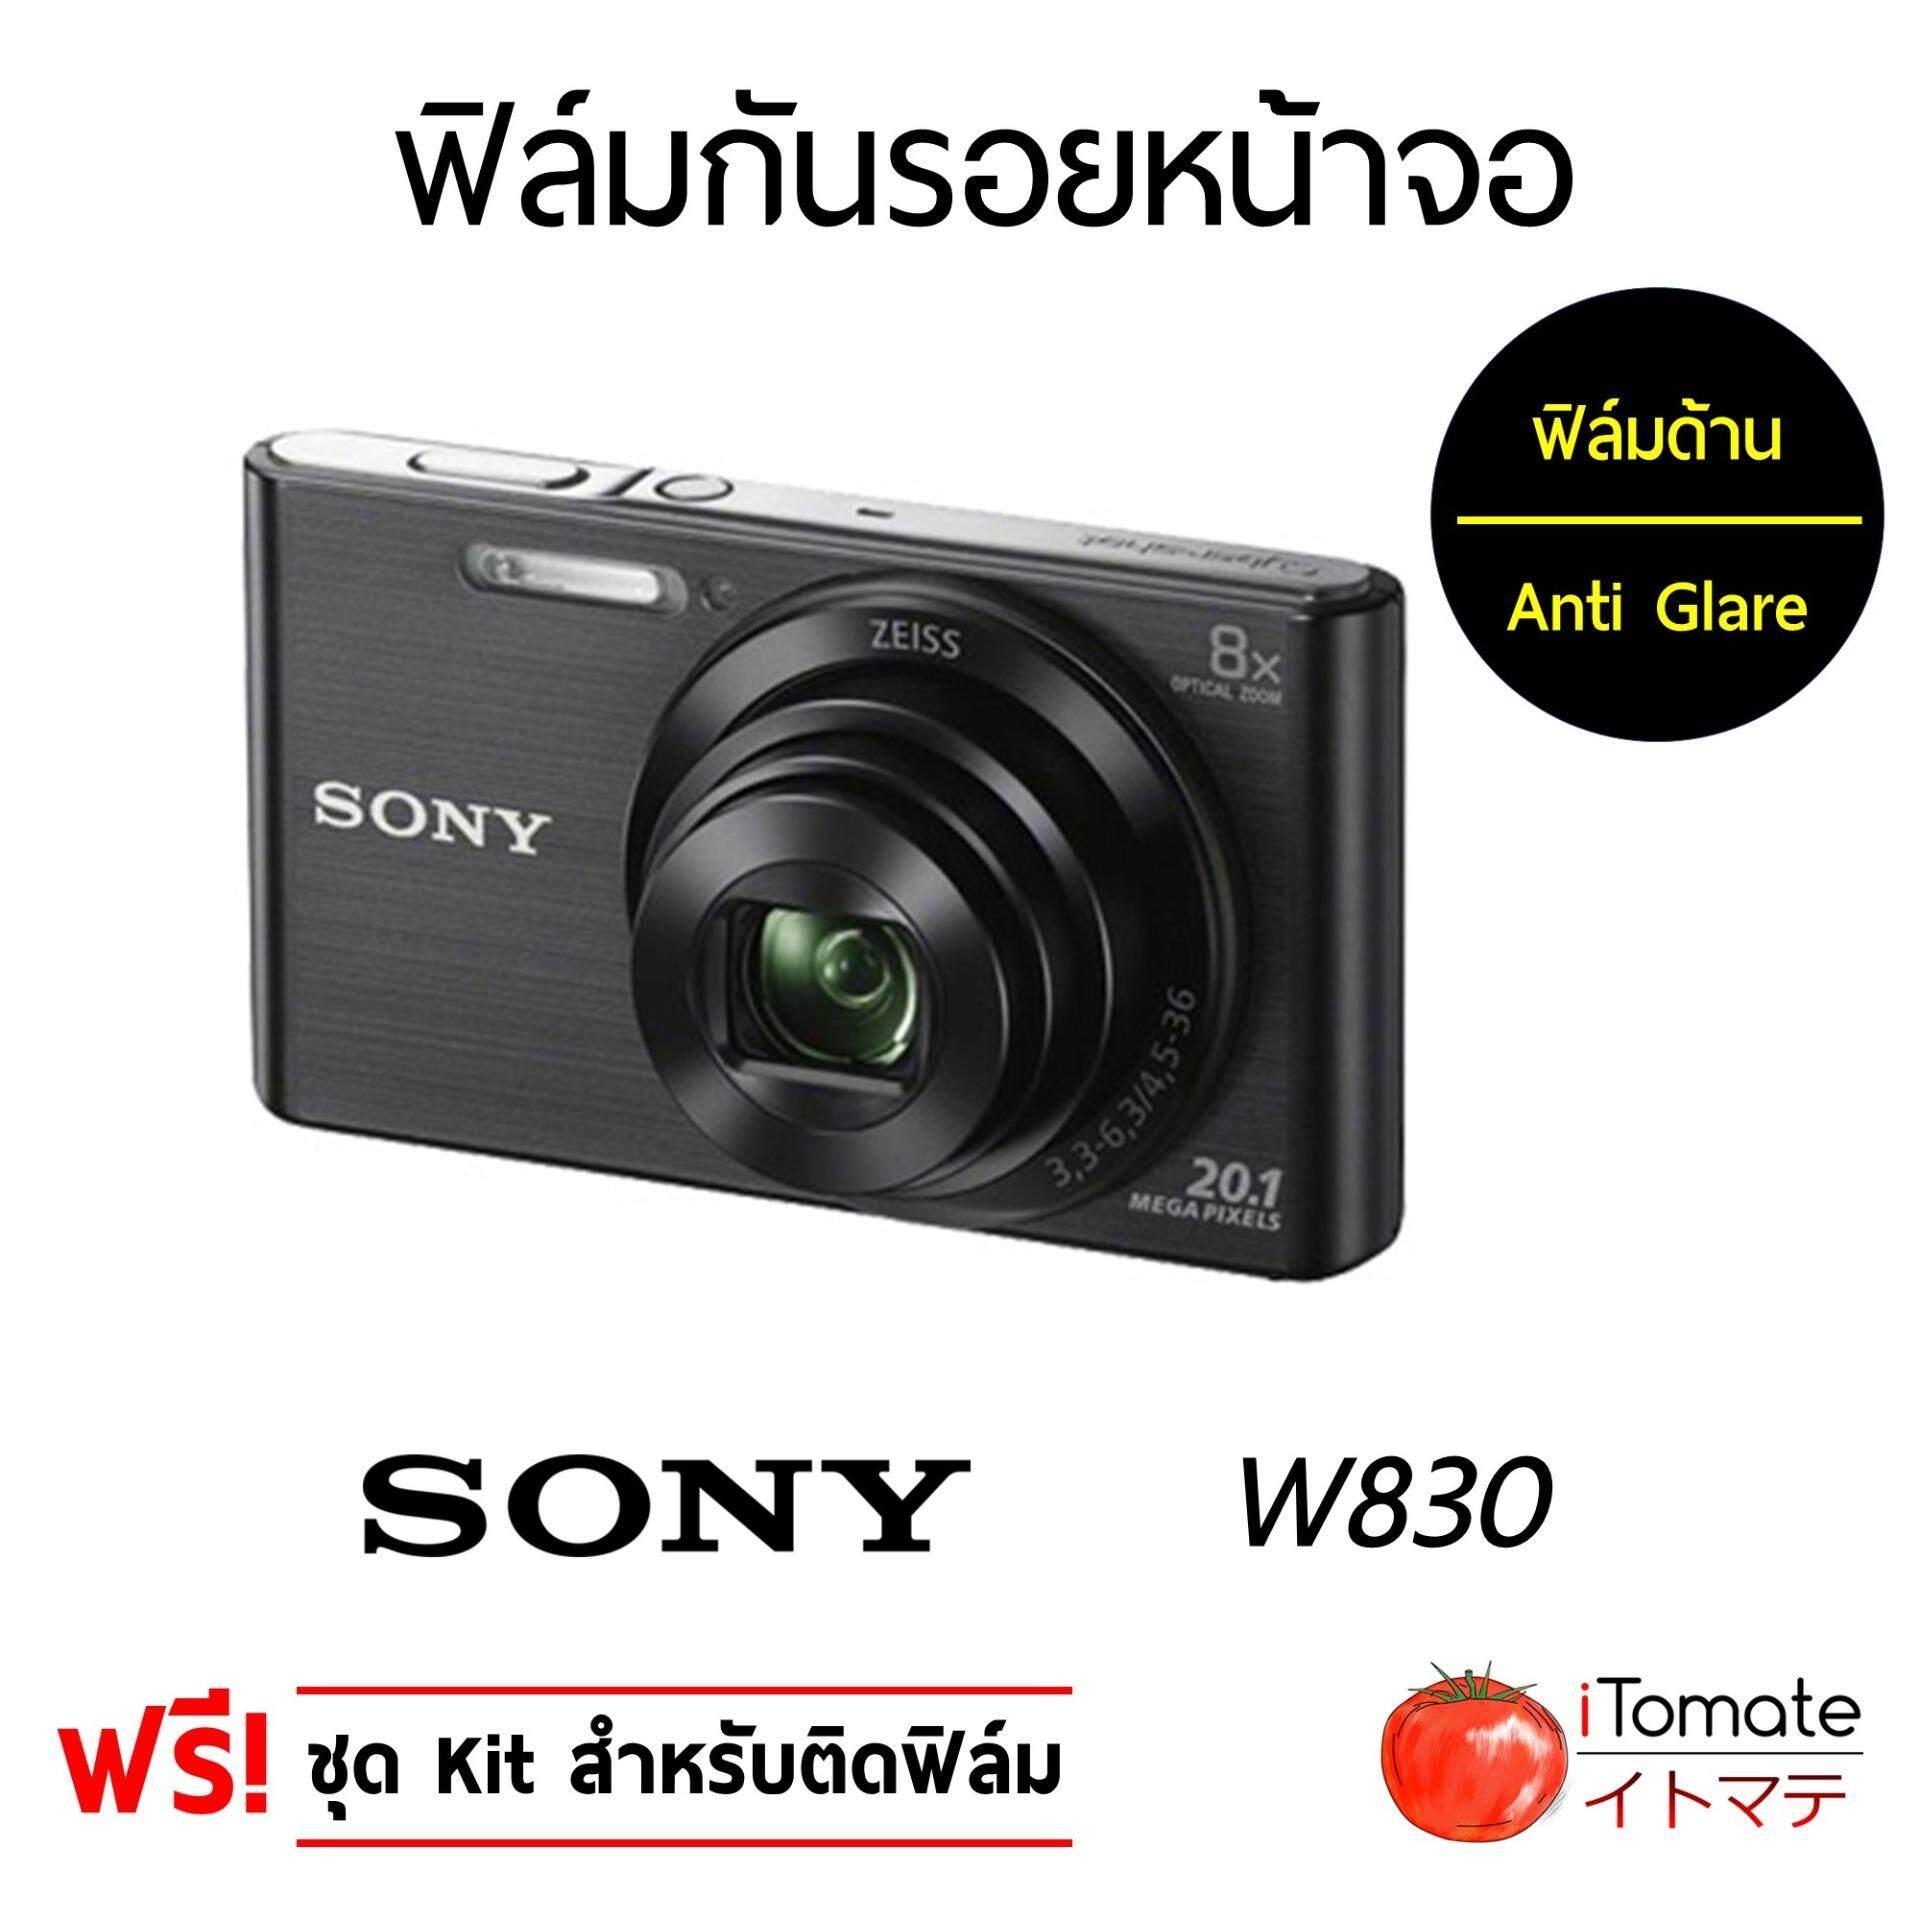 iTomate ฟิล์มกันรอย แบบด้าน Sony W830